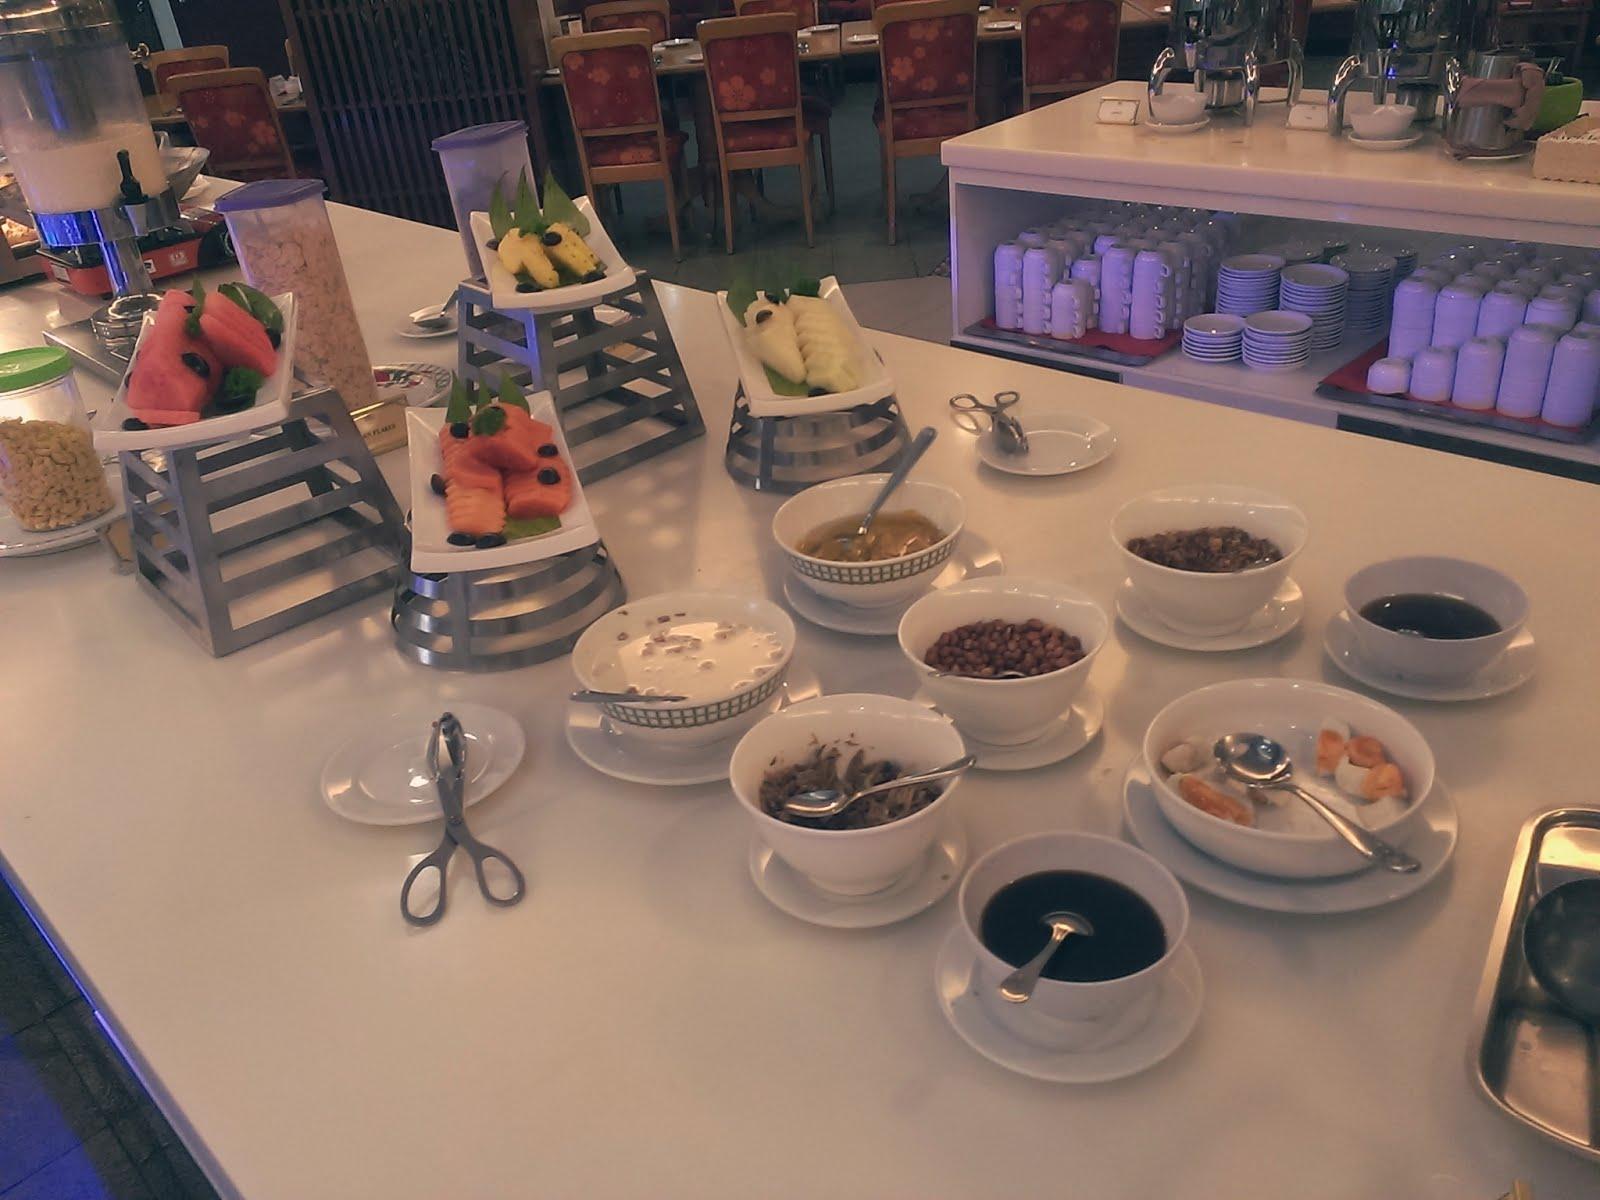 Allson Klana Seremban Hotel - Seremban, Negeri Sembilan